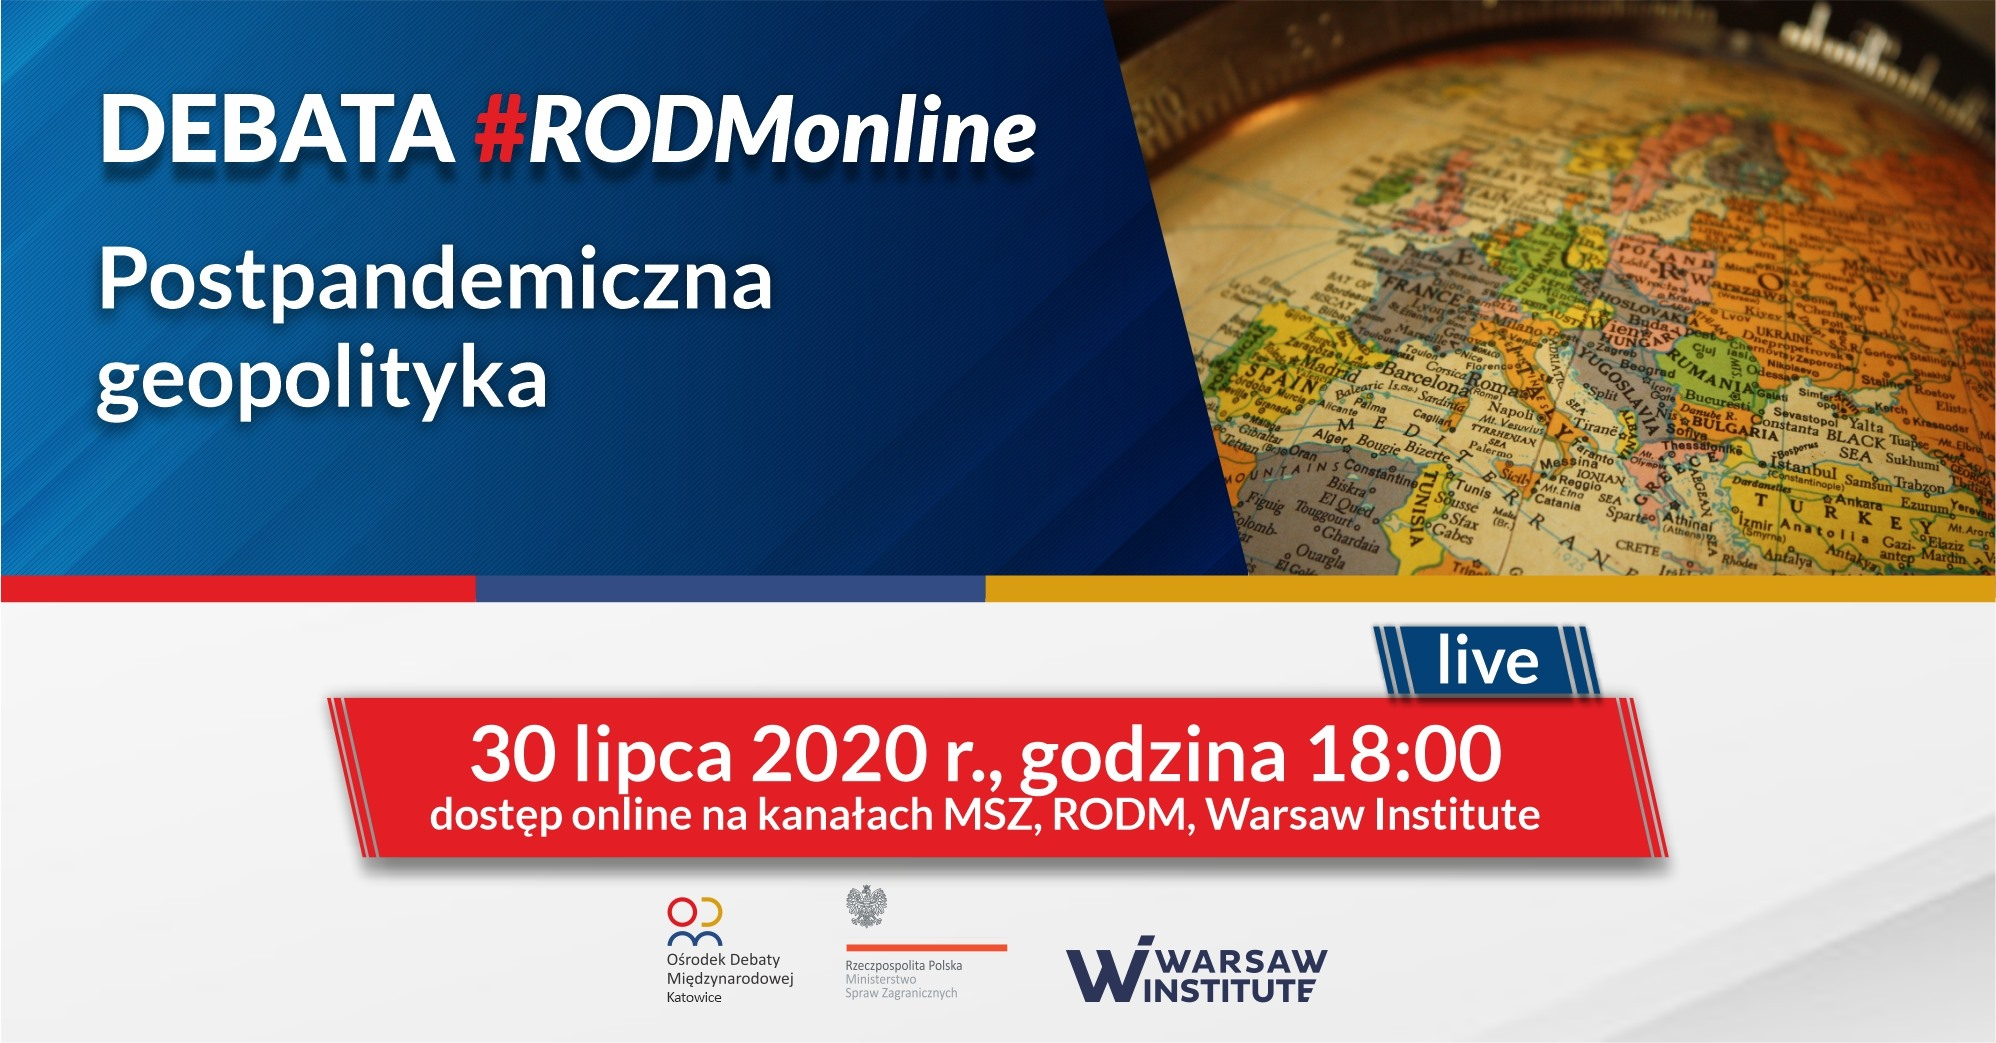 Postpandemiczna geopolityka | Debata #RODMonline